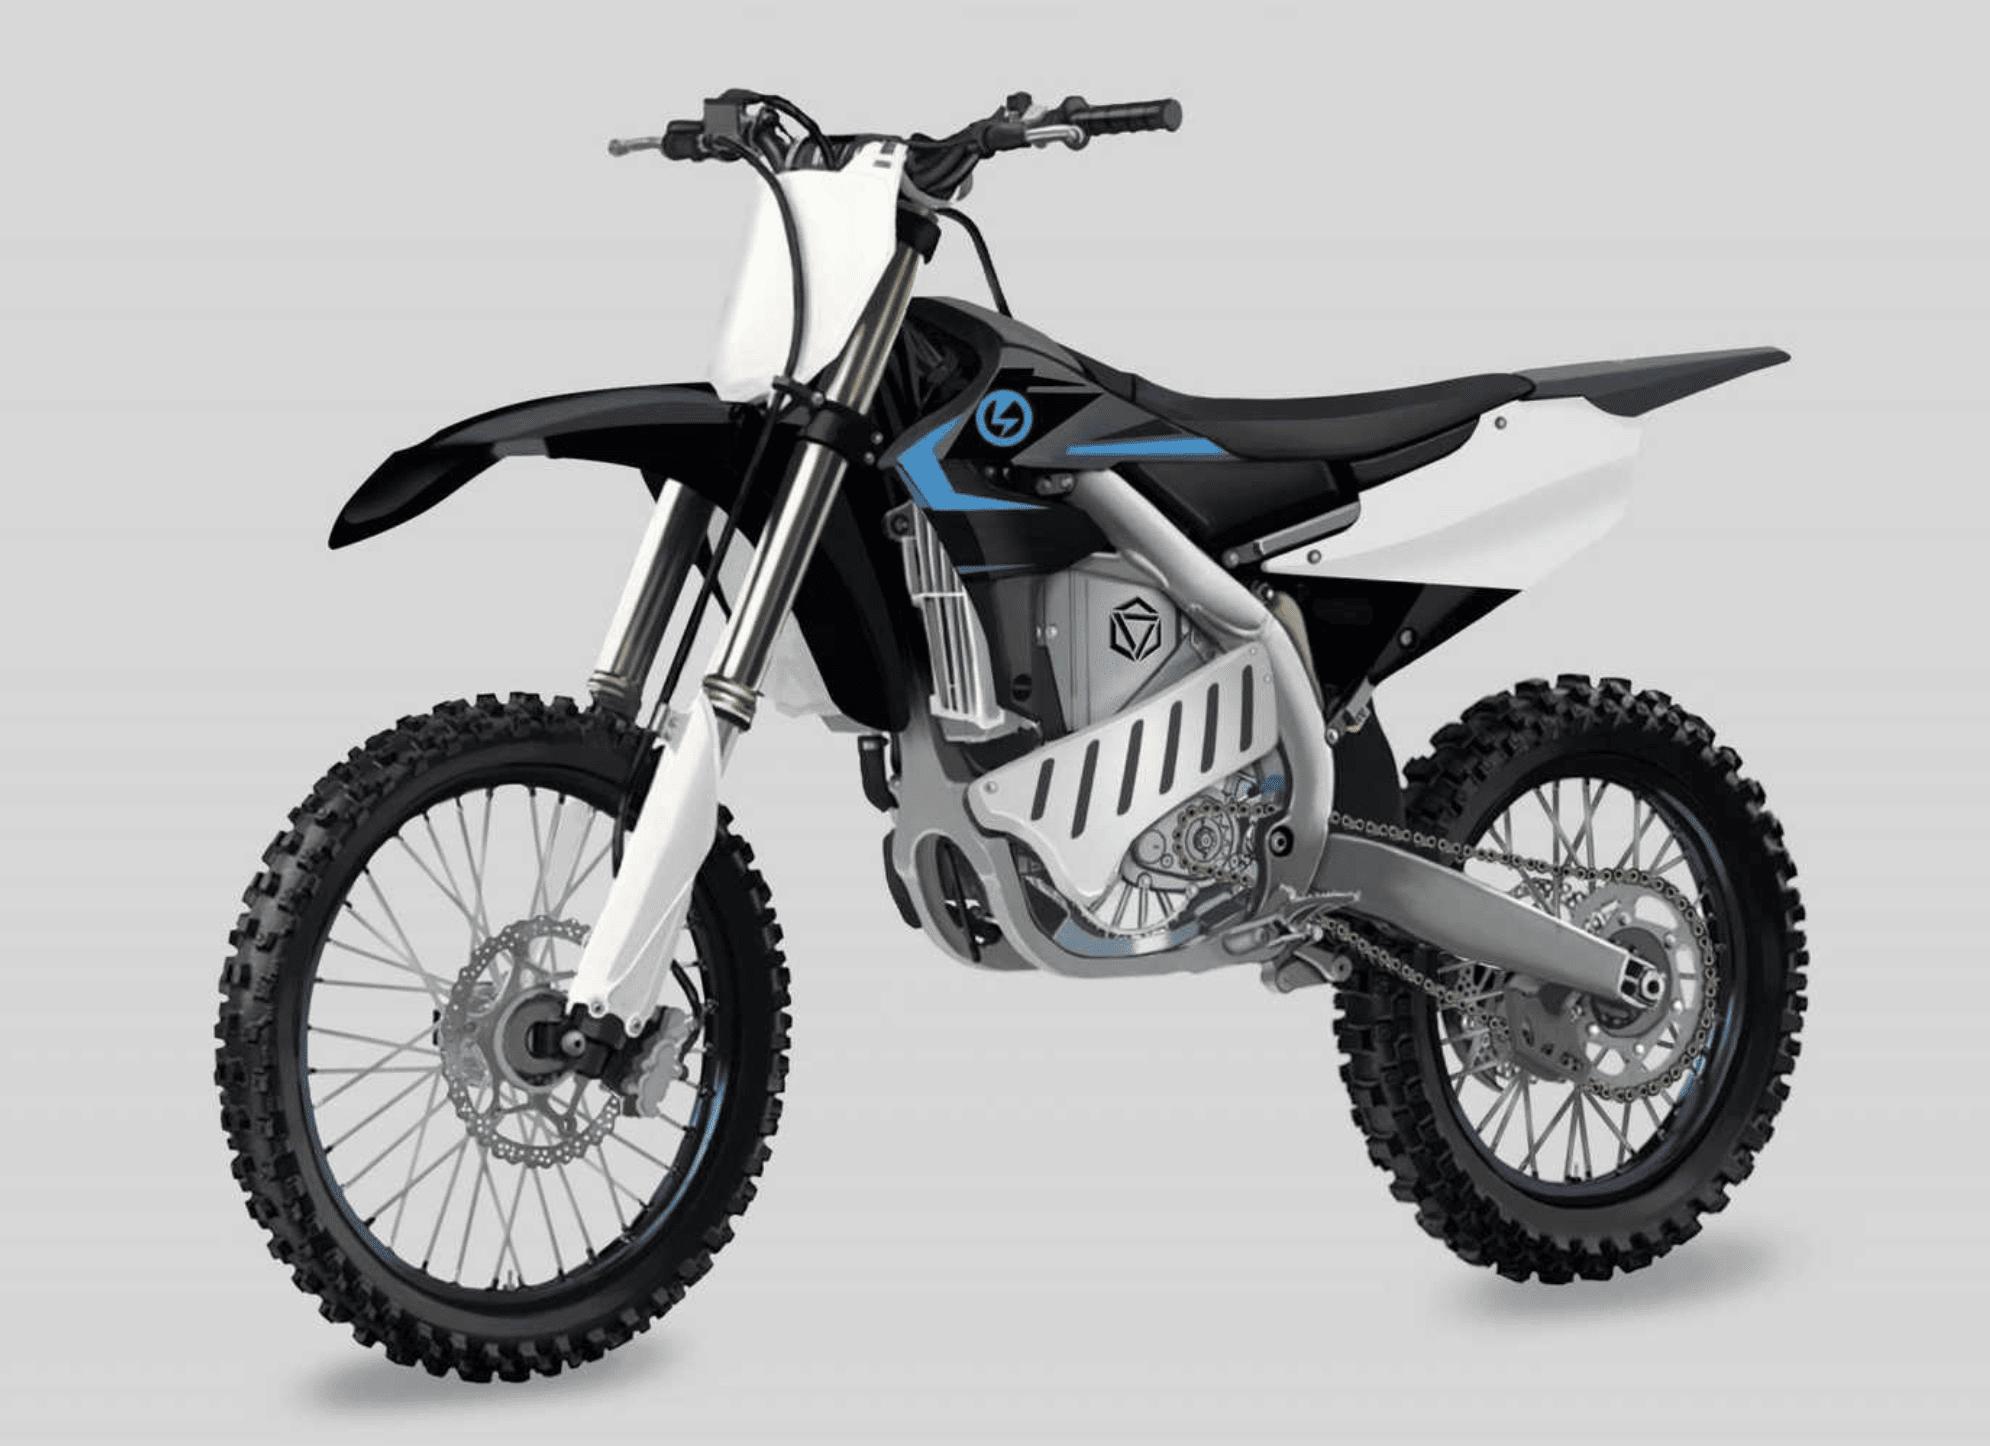 Yamaha Prototype electric dirt bike